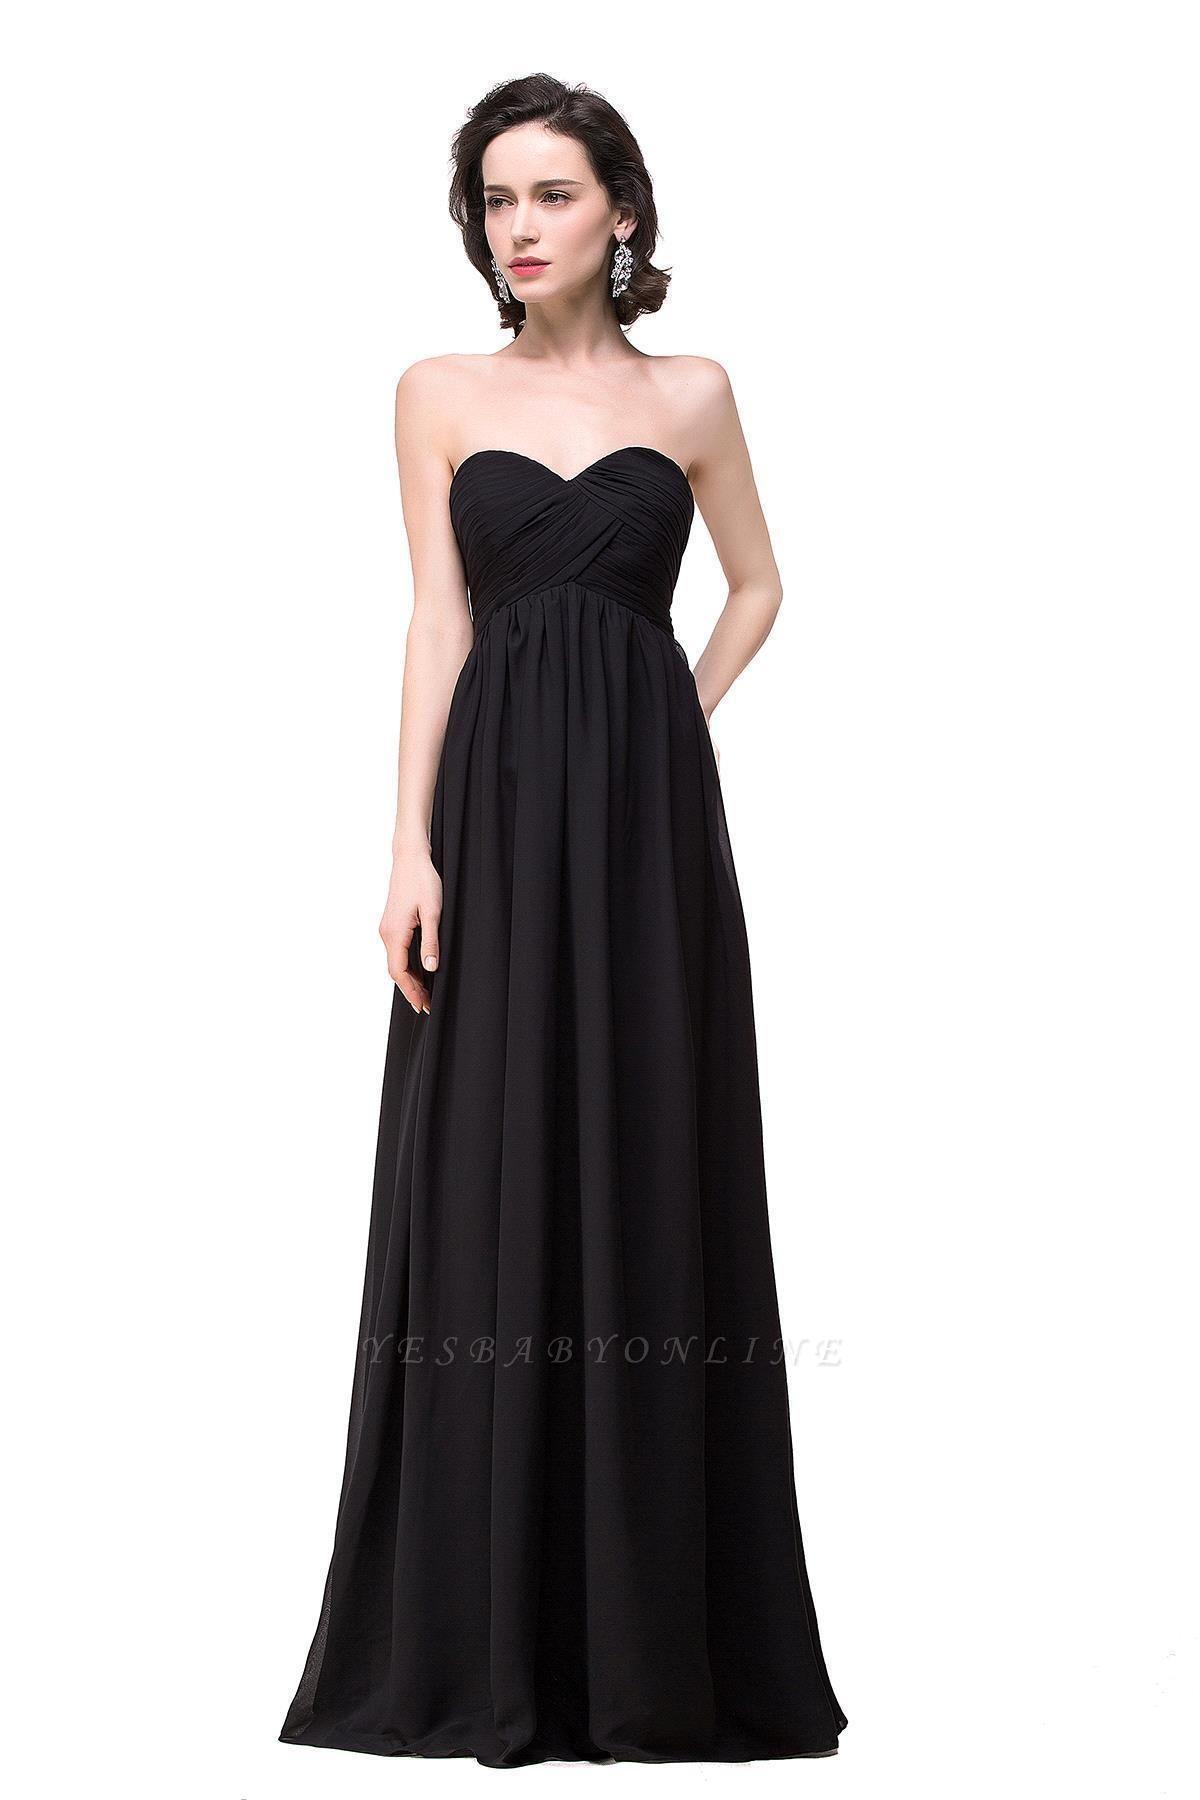 A-line Strapless Chiffon Bridesmaid Dress with Draped